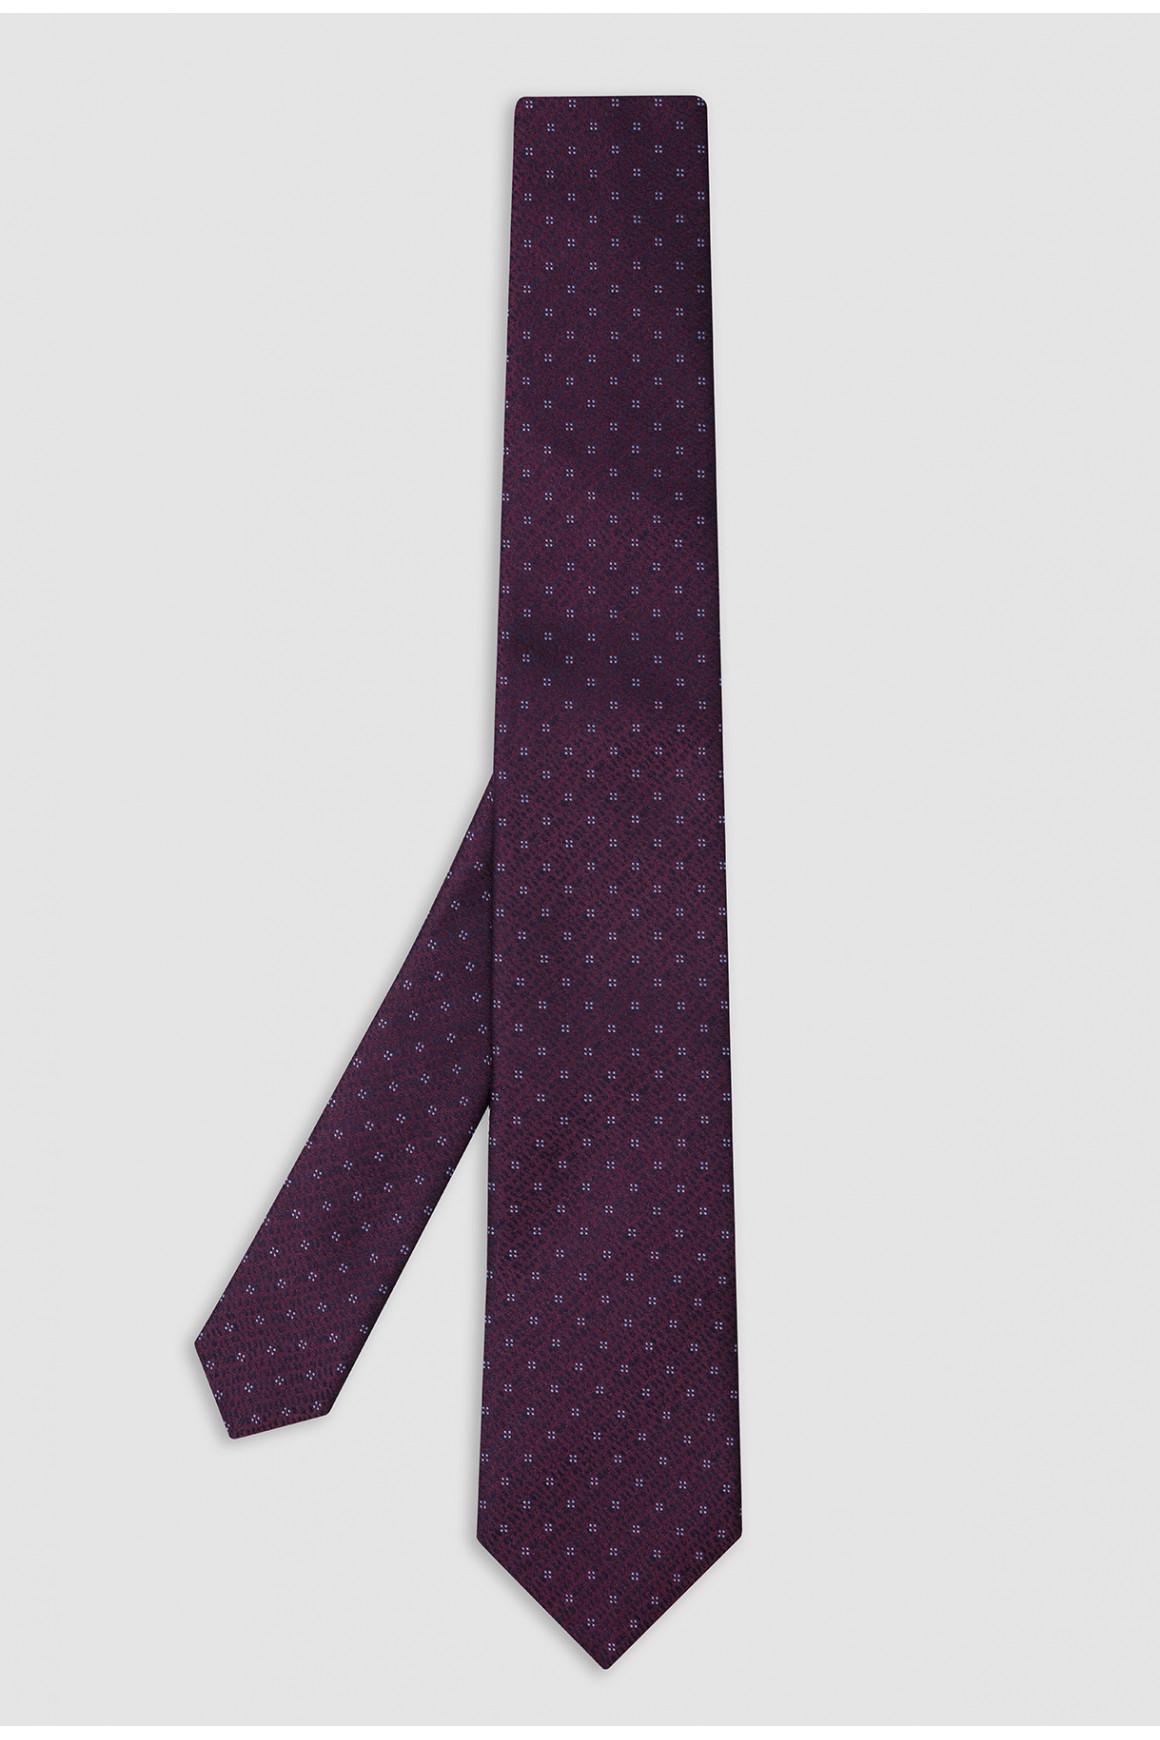 Cravate Prune Micromotif Soie